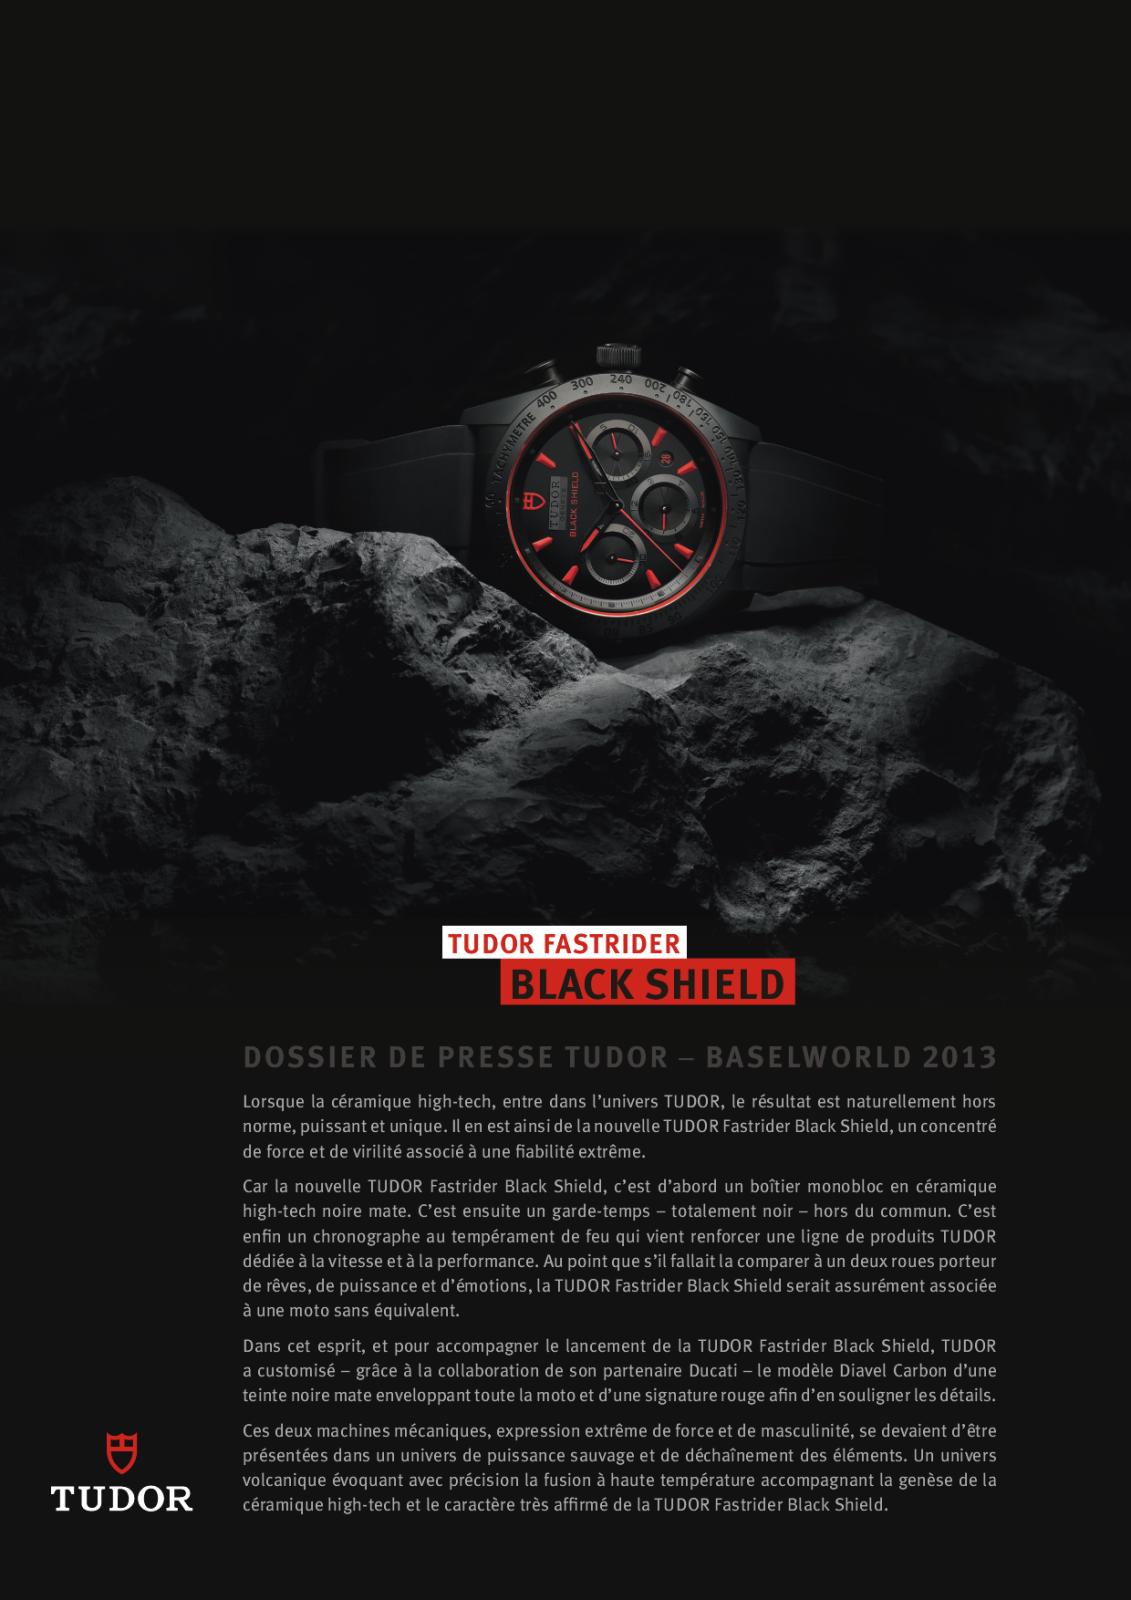 Baselworld 2013: Tudor - Black Shield 2mc8uv4